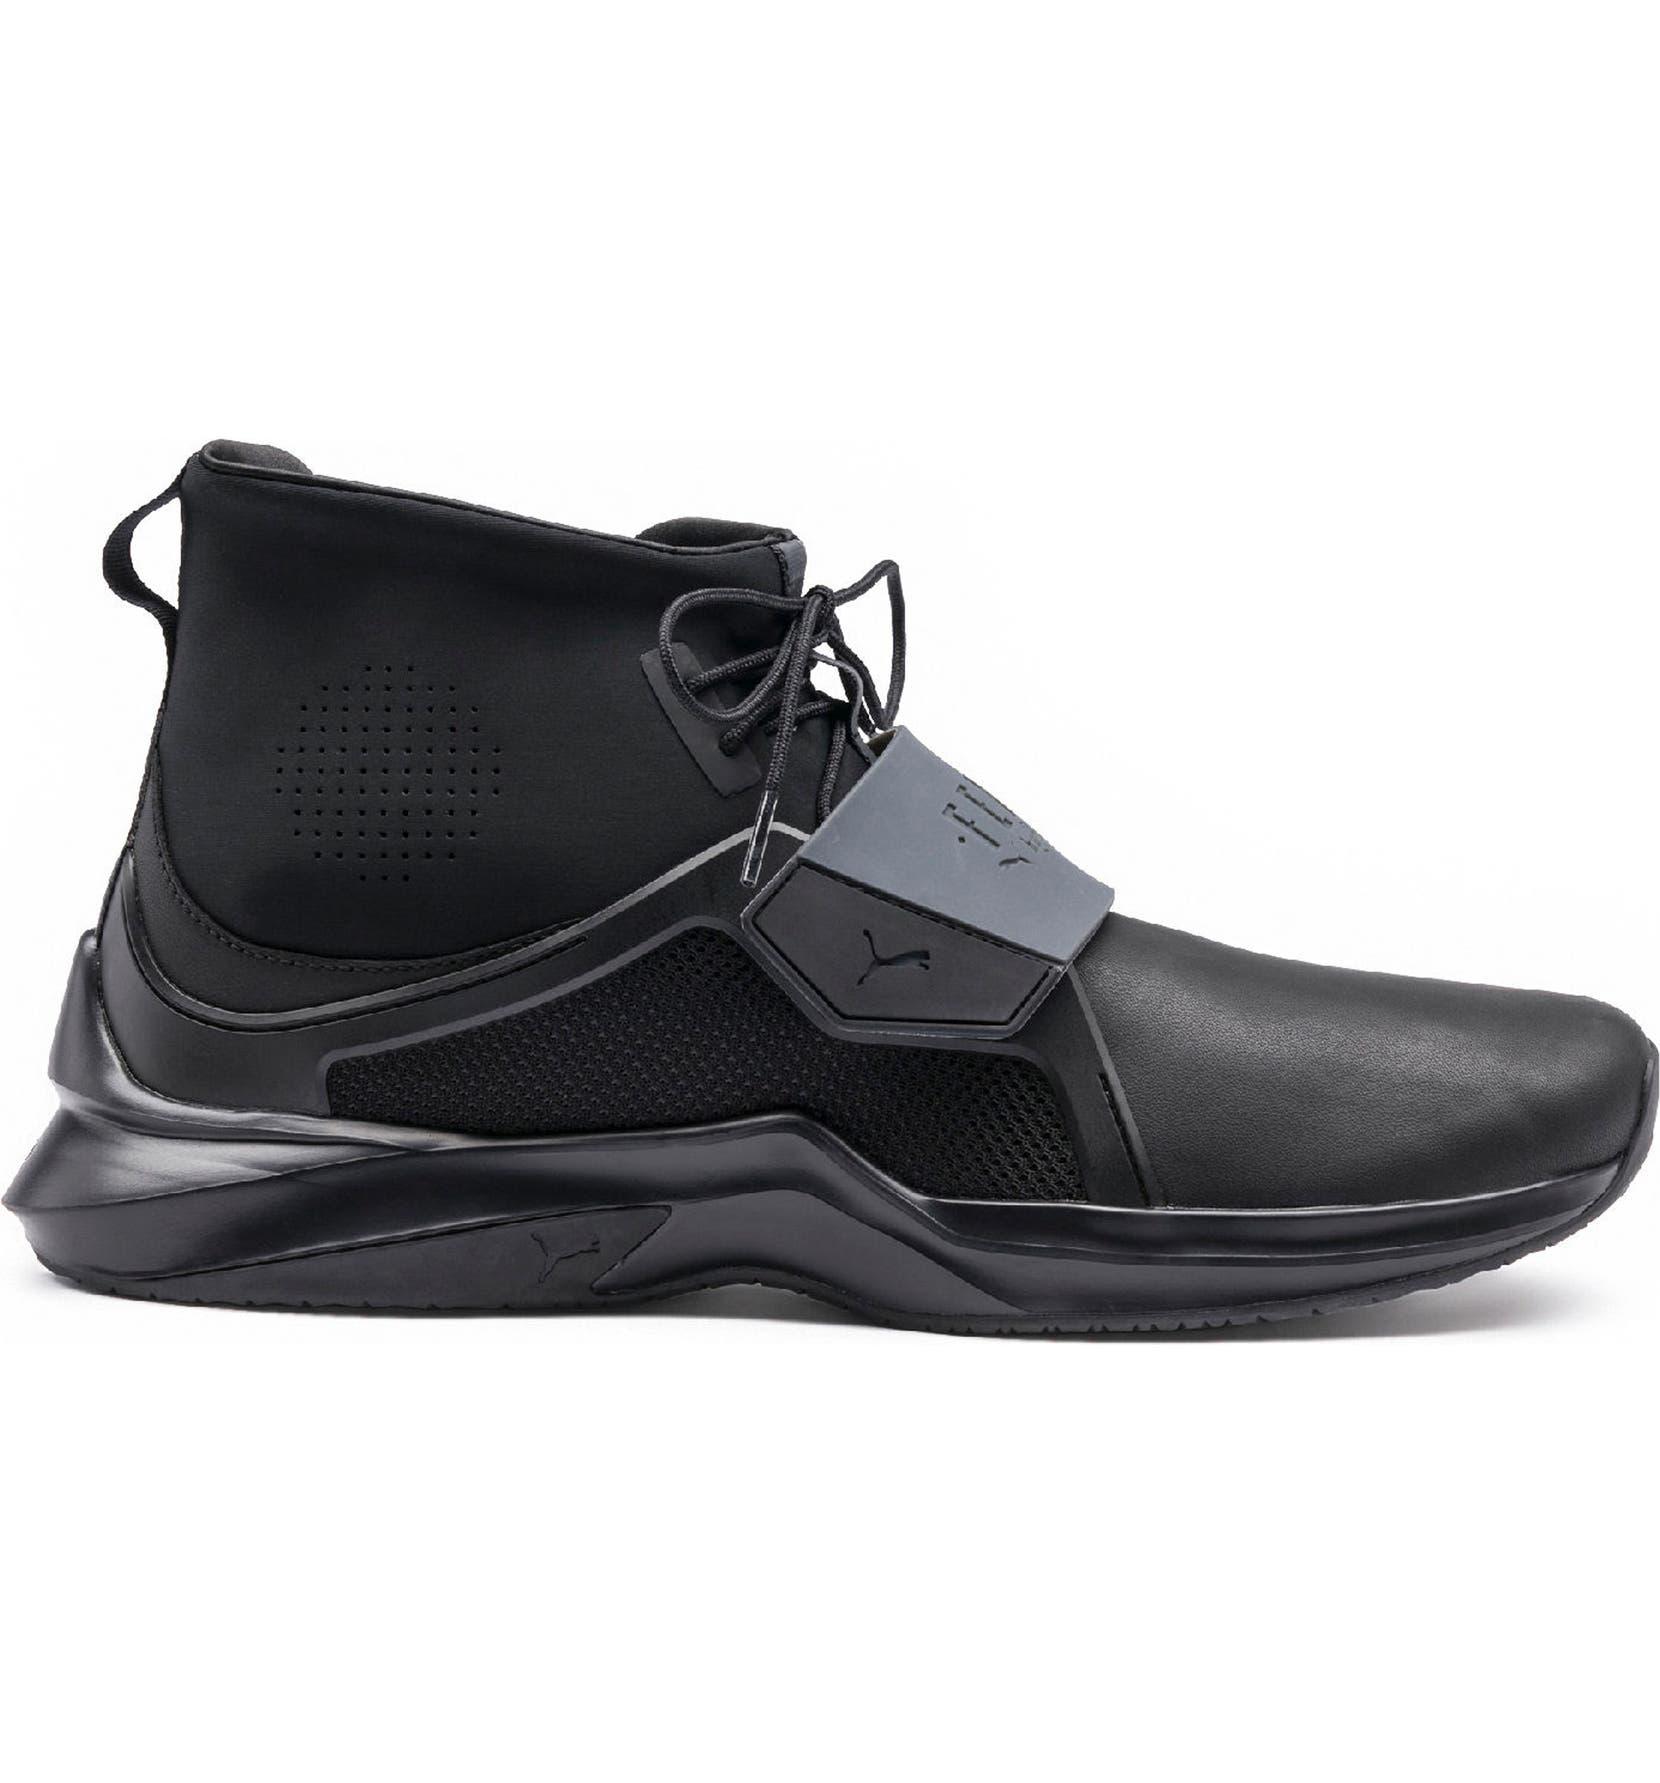 2367a7b6702 FENTY PUMA by Rihanna Trainer Sneaker (Women)